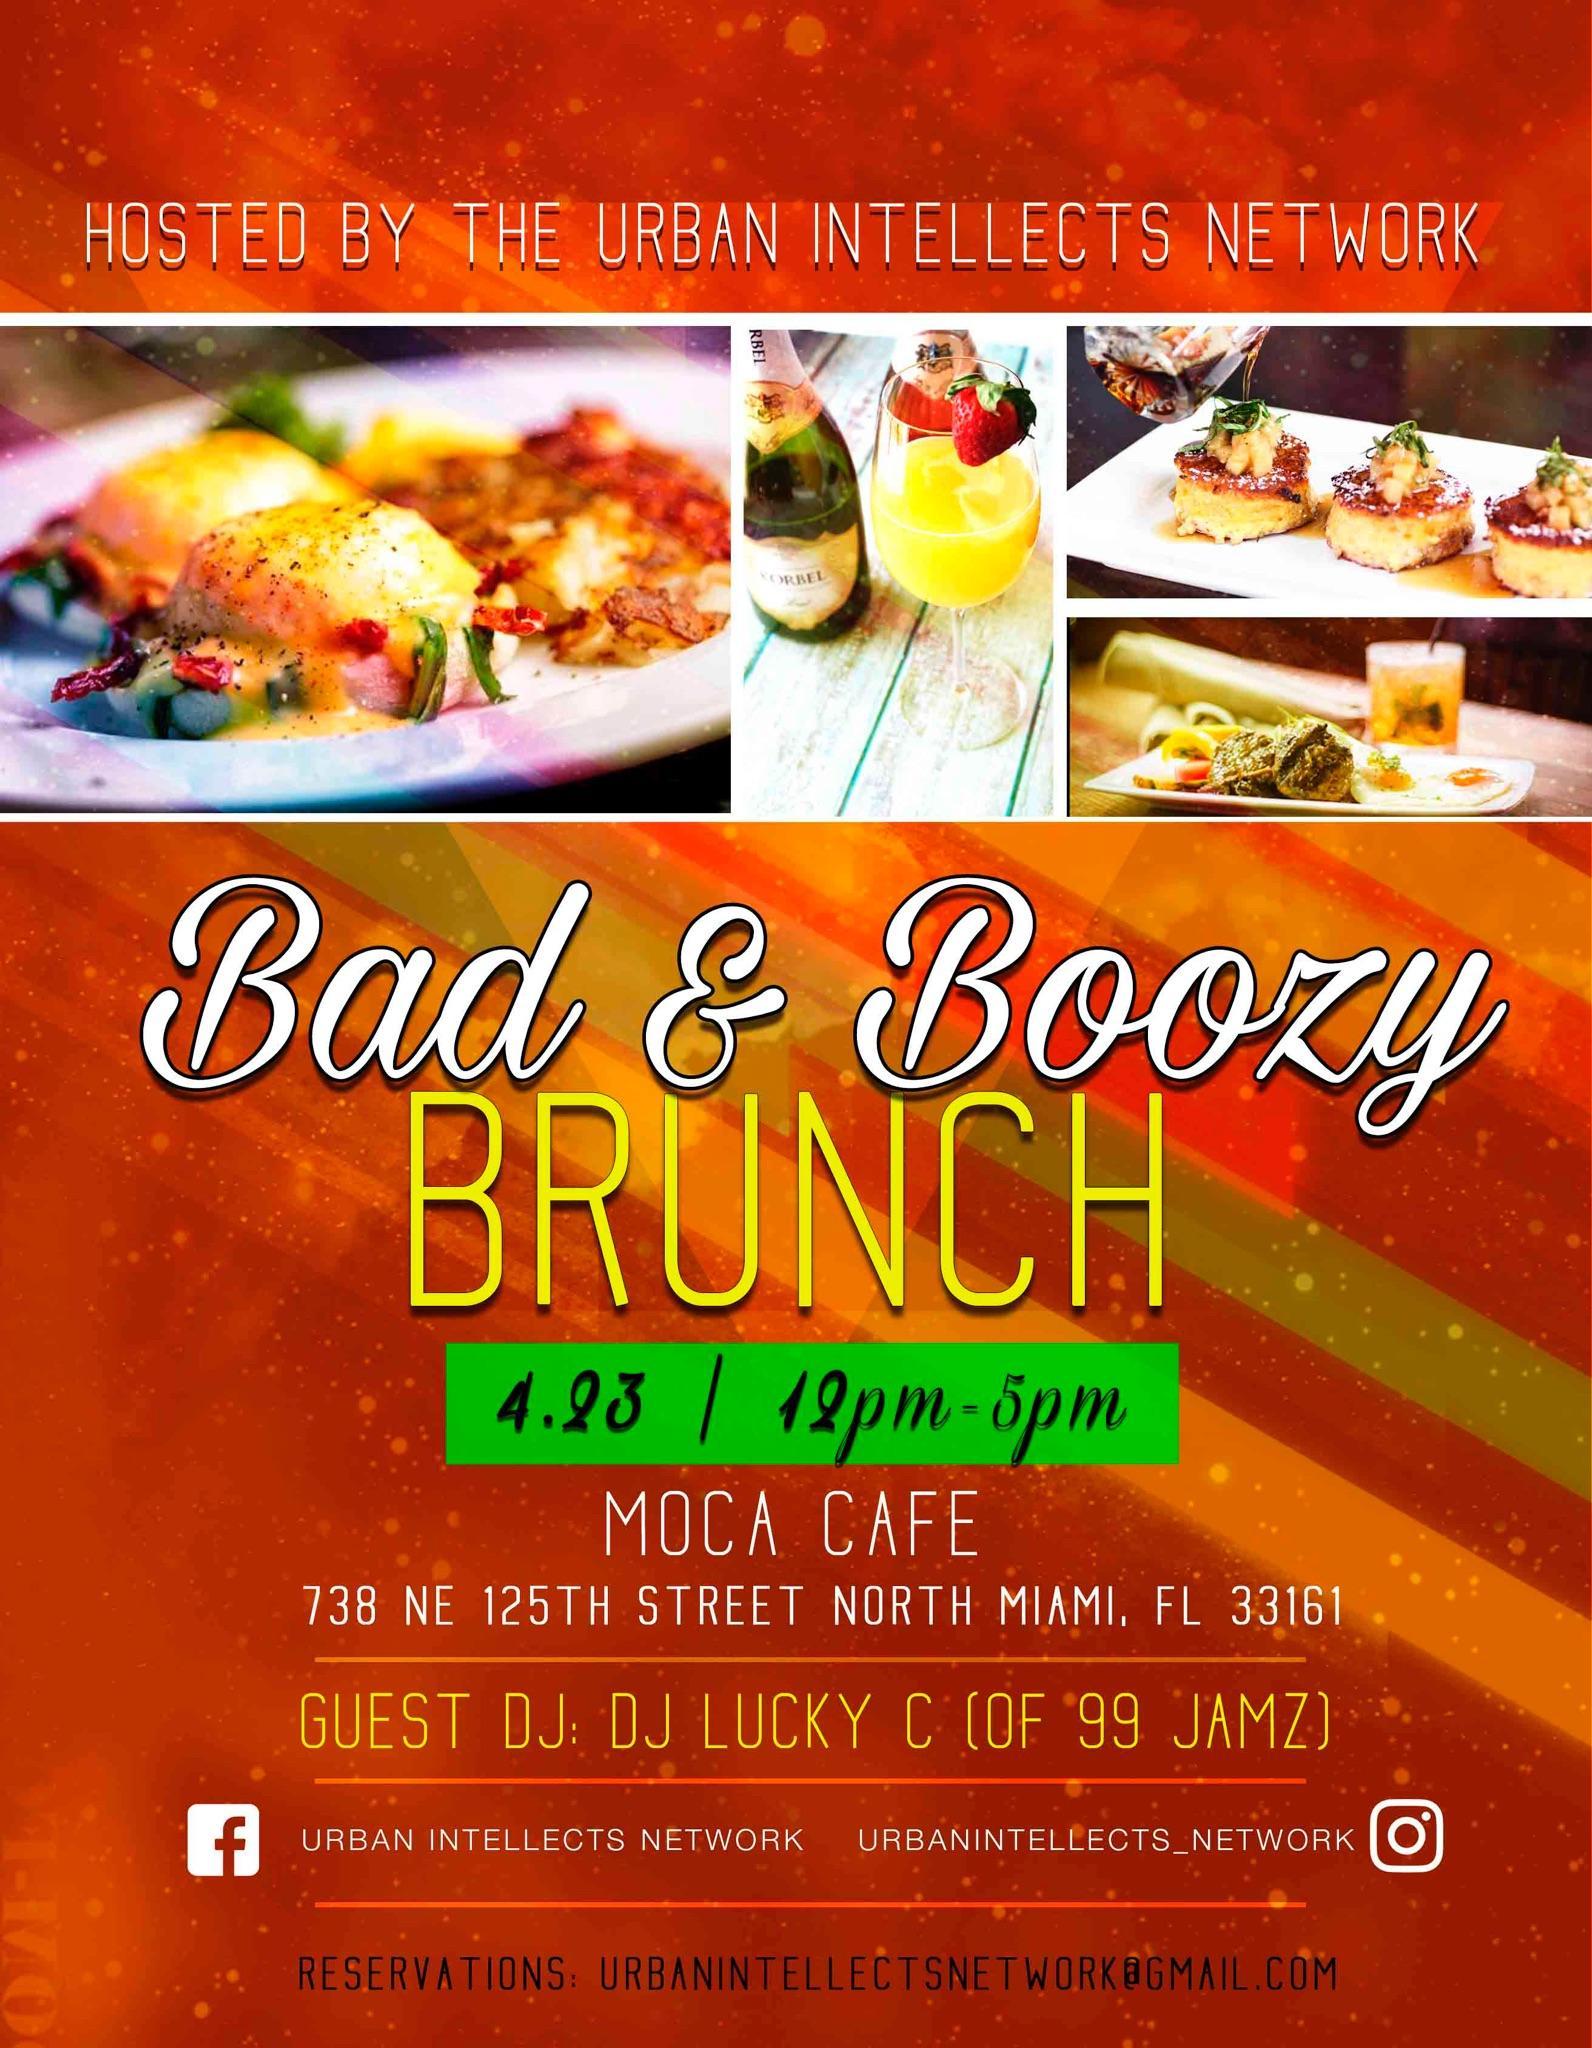 Bad & Boozy Brunch Sunday's at Moca Cafe & Lounge. Bad & Boozy Brunch Sunday's at Moca Cafe & Lounge